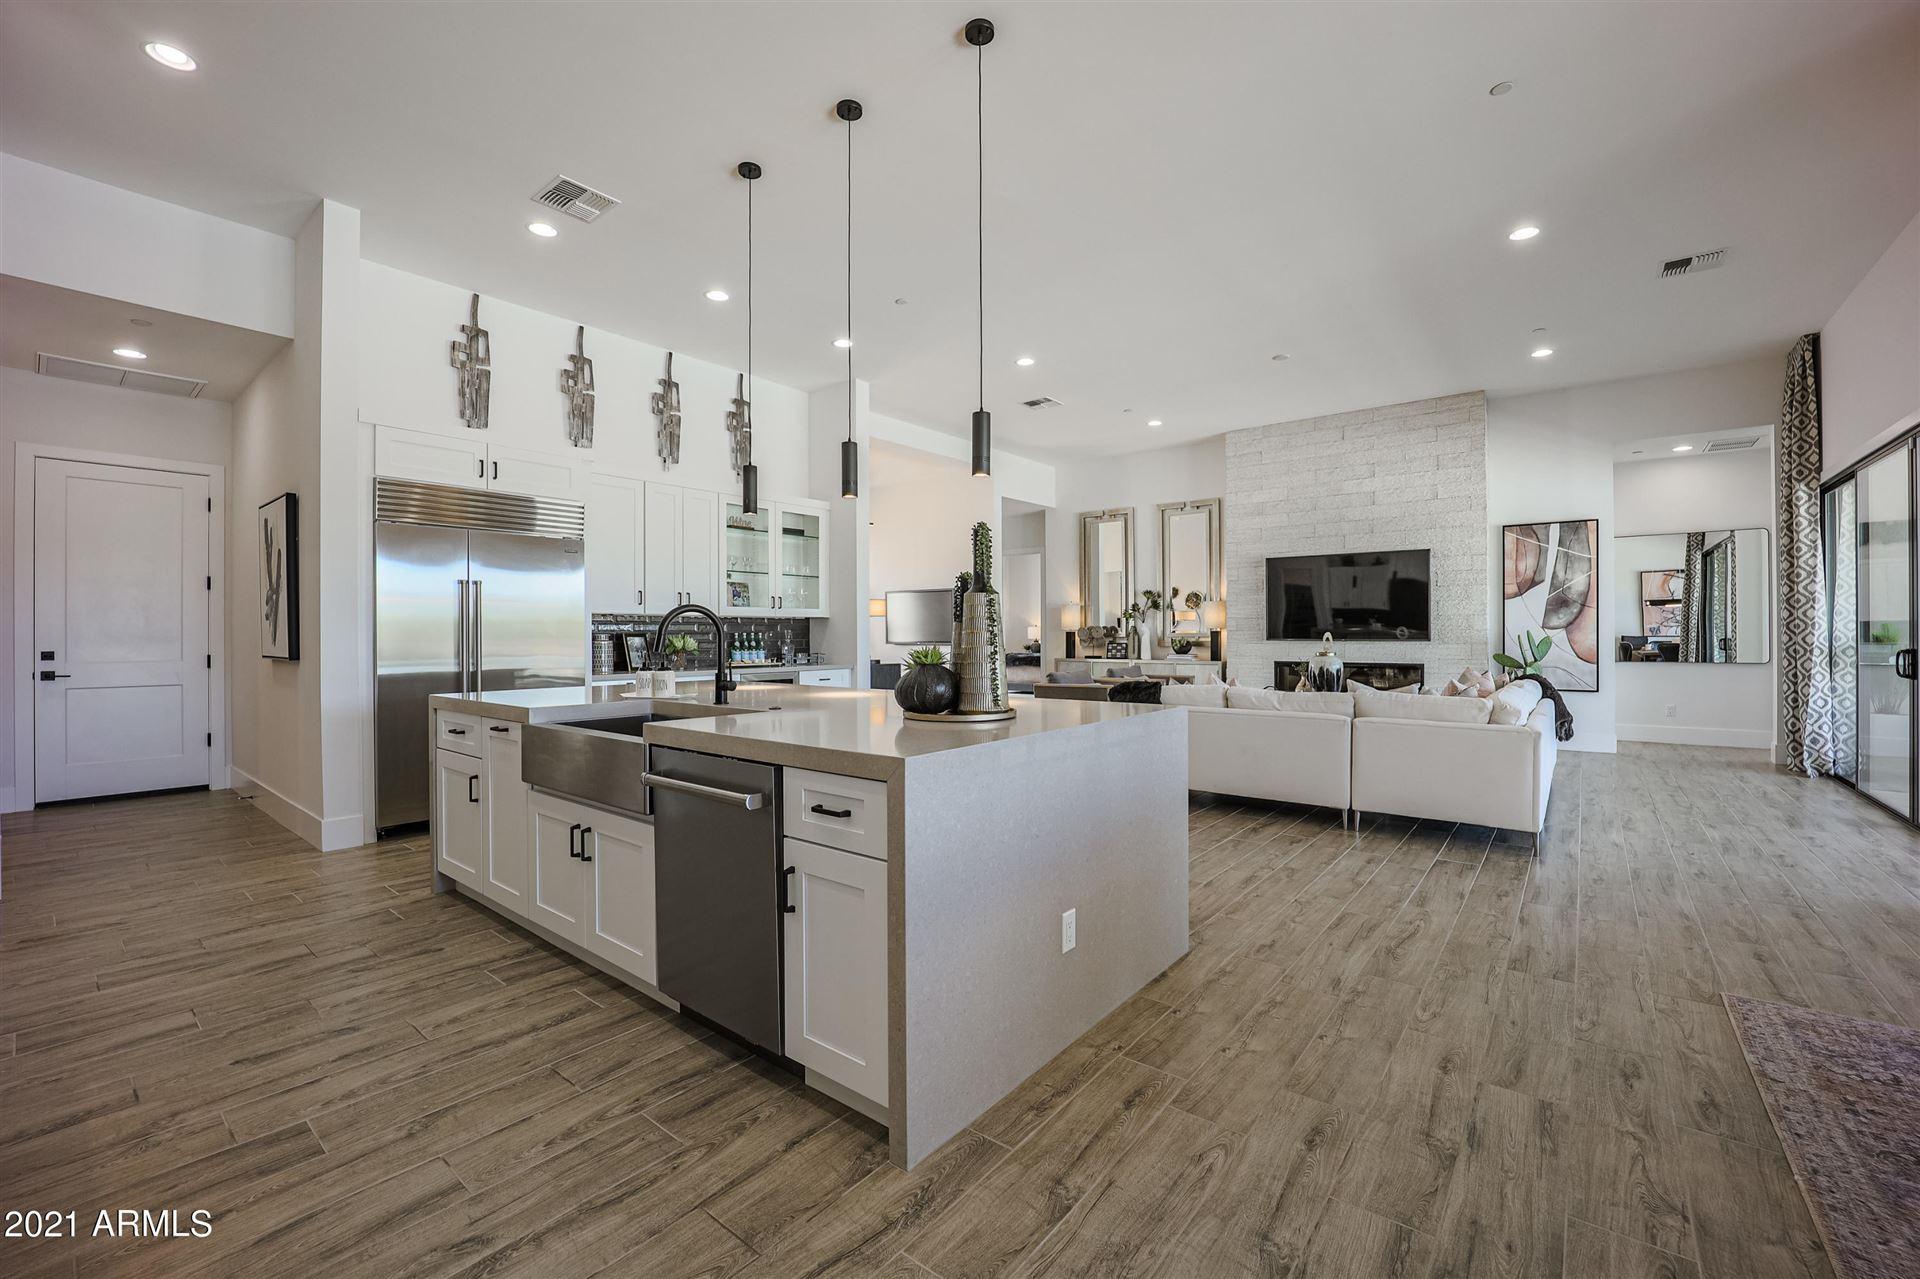 Photo of Xx215 N 21 Avenue, Desert Hills, AZ 85086 (MLS # 6232611)